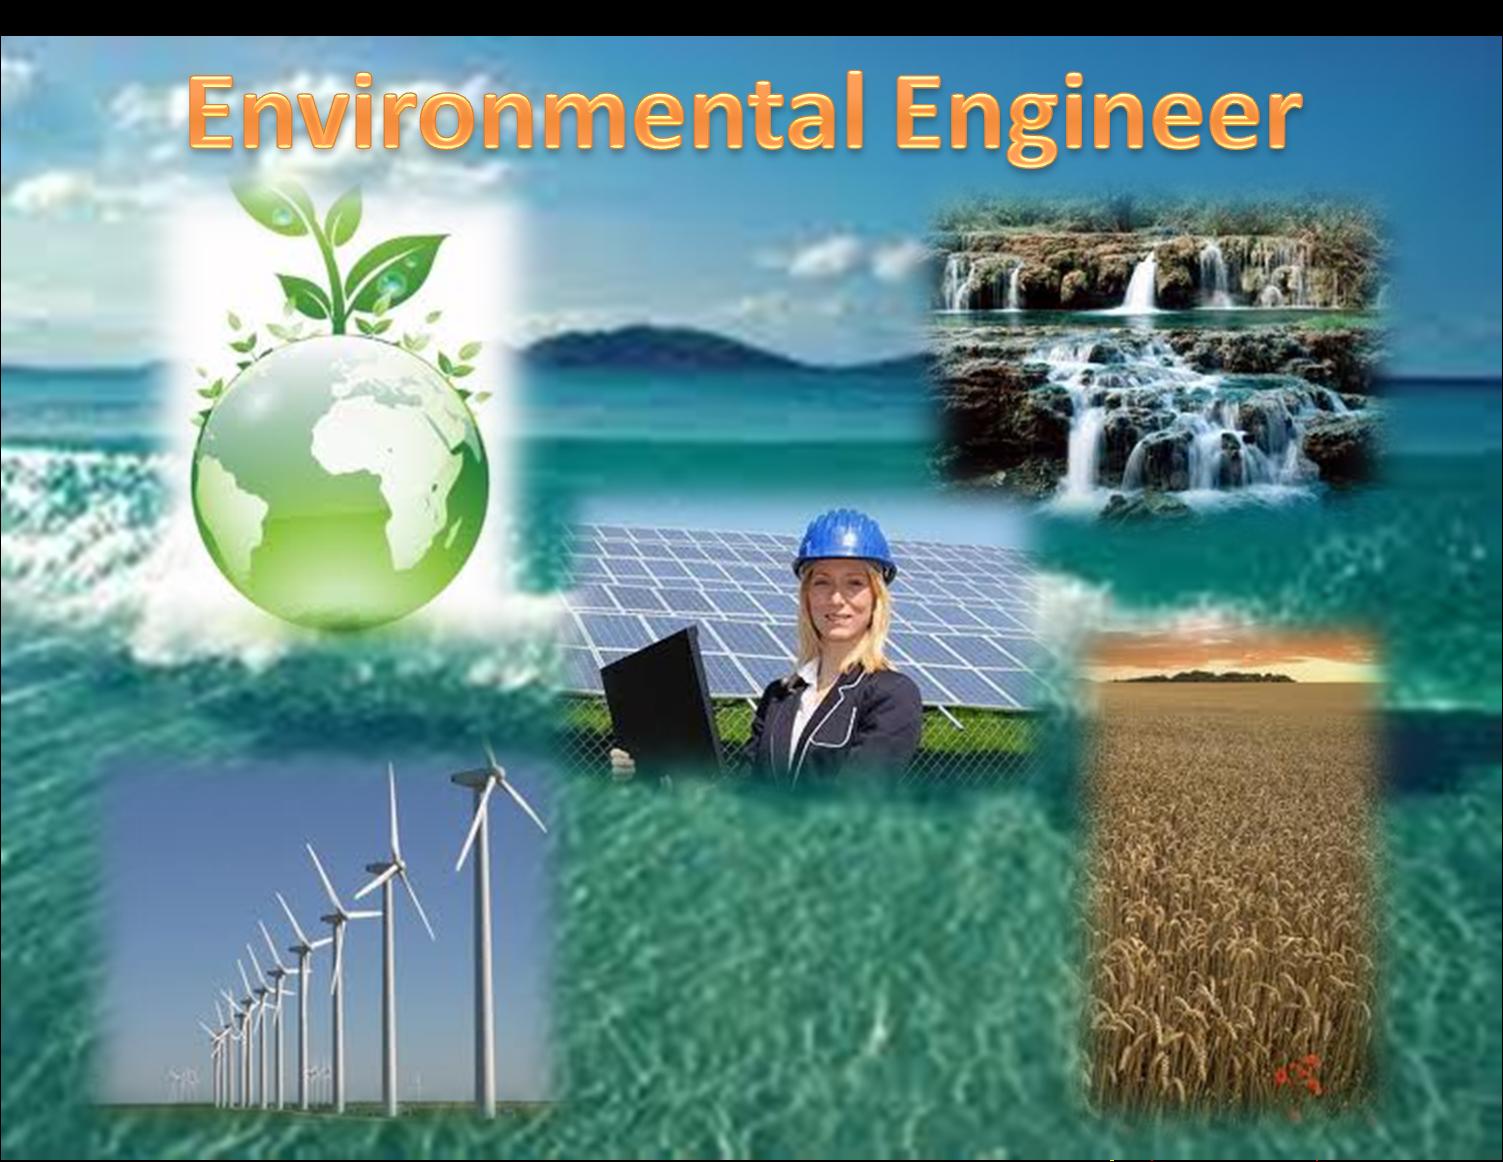 Environmental Engineering Pictures to Pin PinsDaddy – Environmental Engineer Job Description